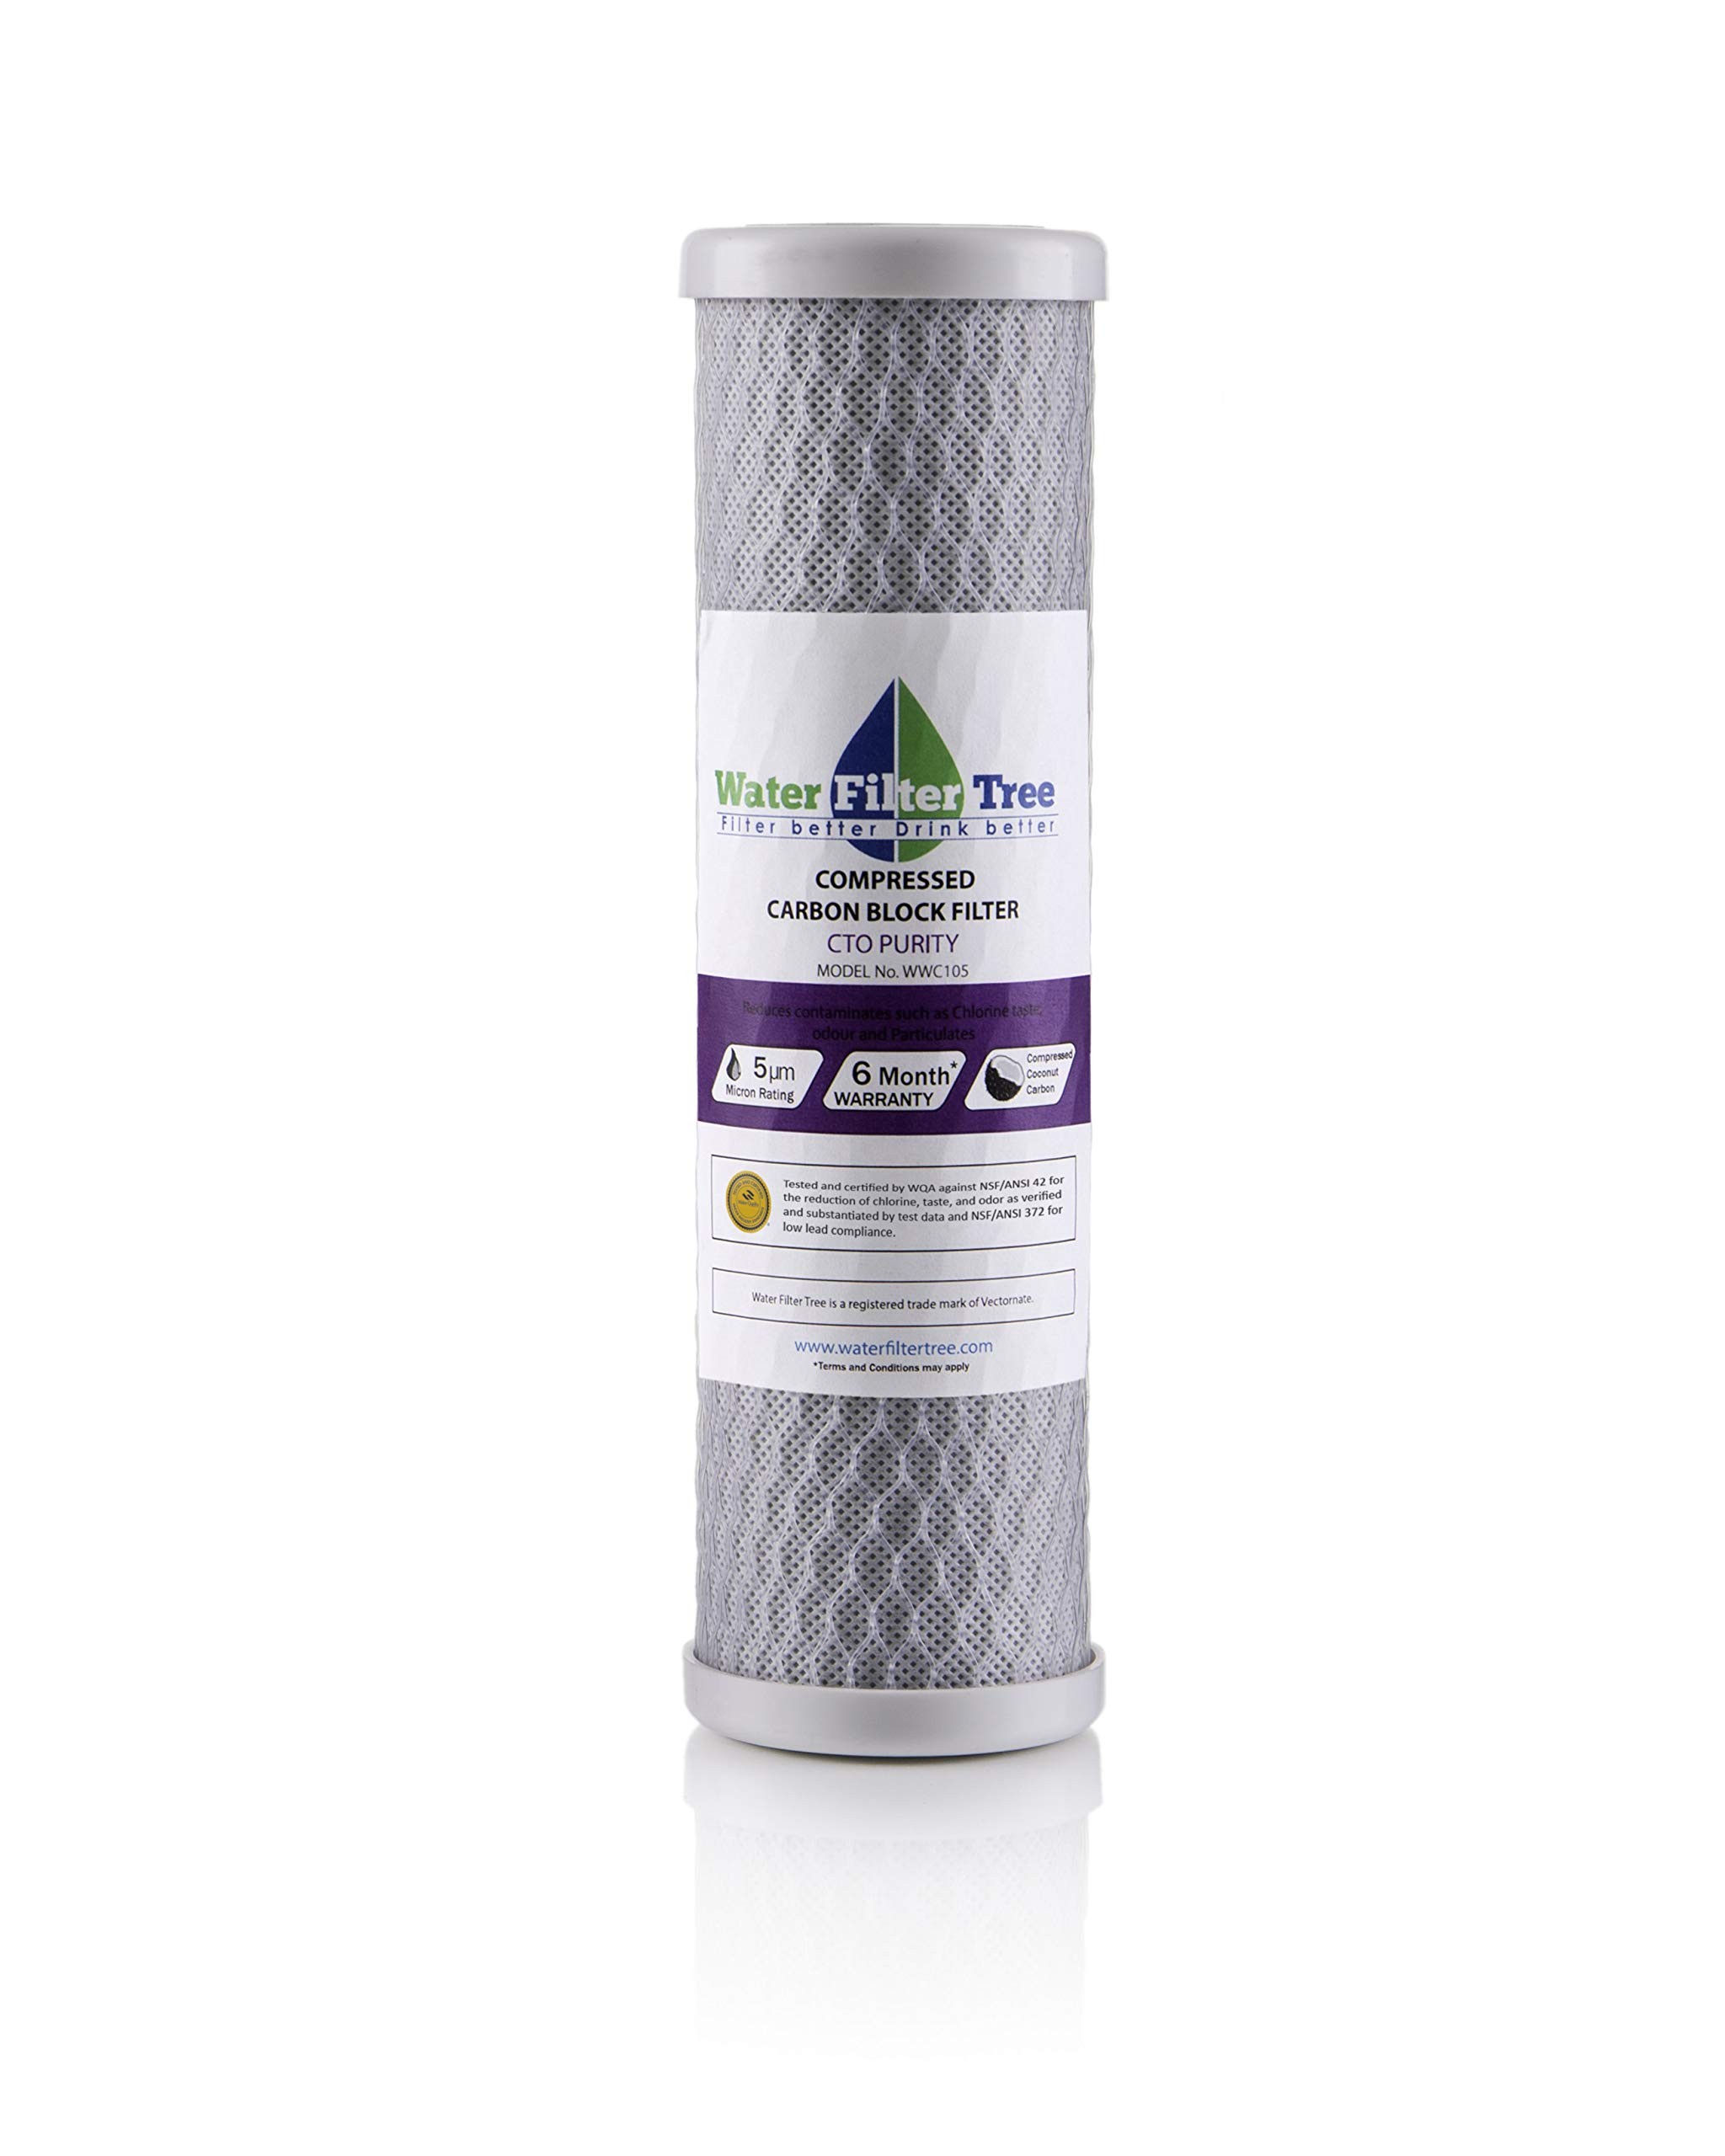 Ventline BCC024600 range hood filter Fits also to 53028 8 X 8 VNF-ZM03 Water Filter Tree